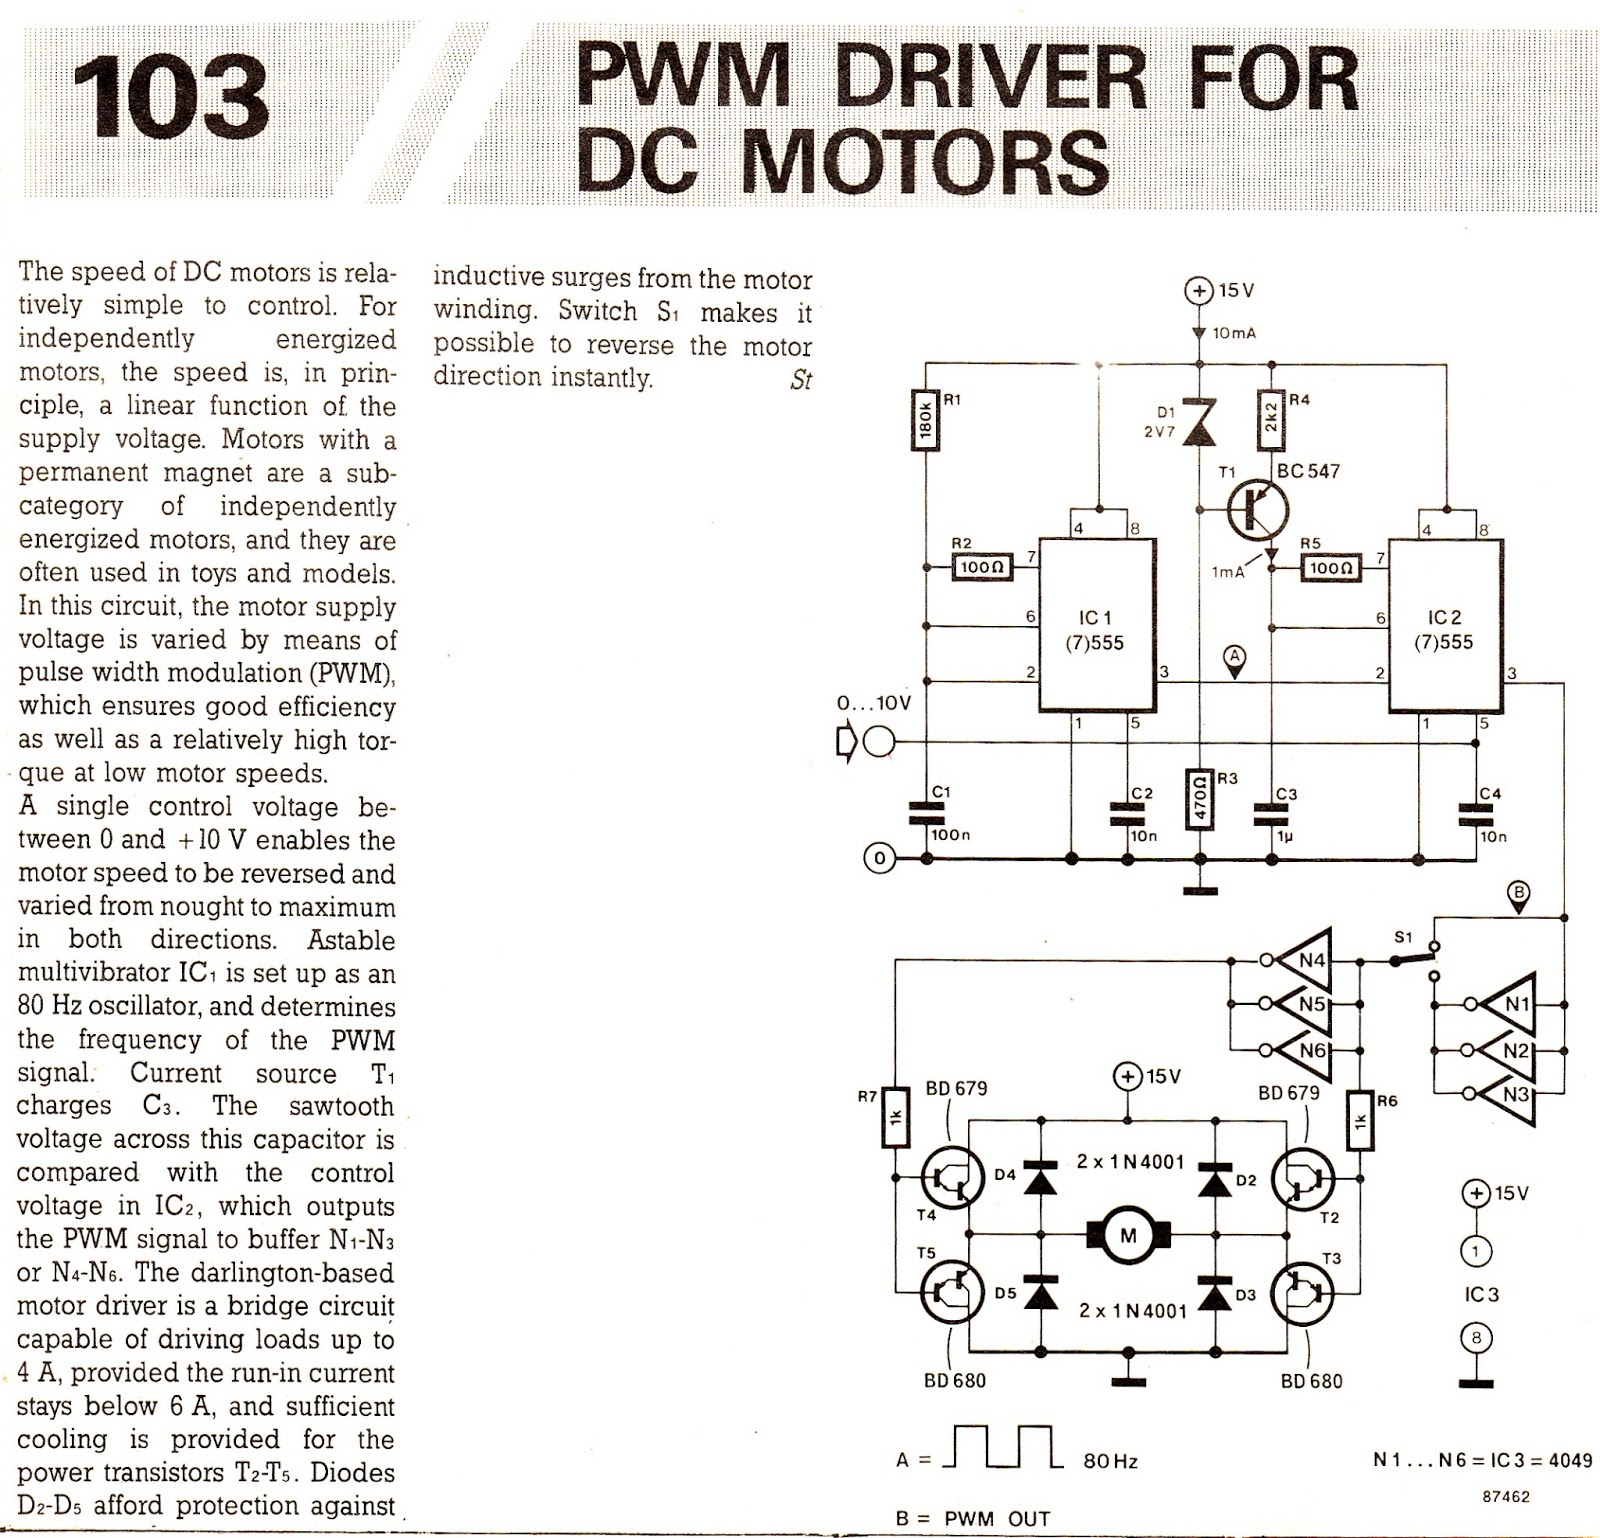 220v Dc Motor Contel Circuit Digarm   Circuit Diagram Images